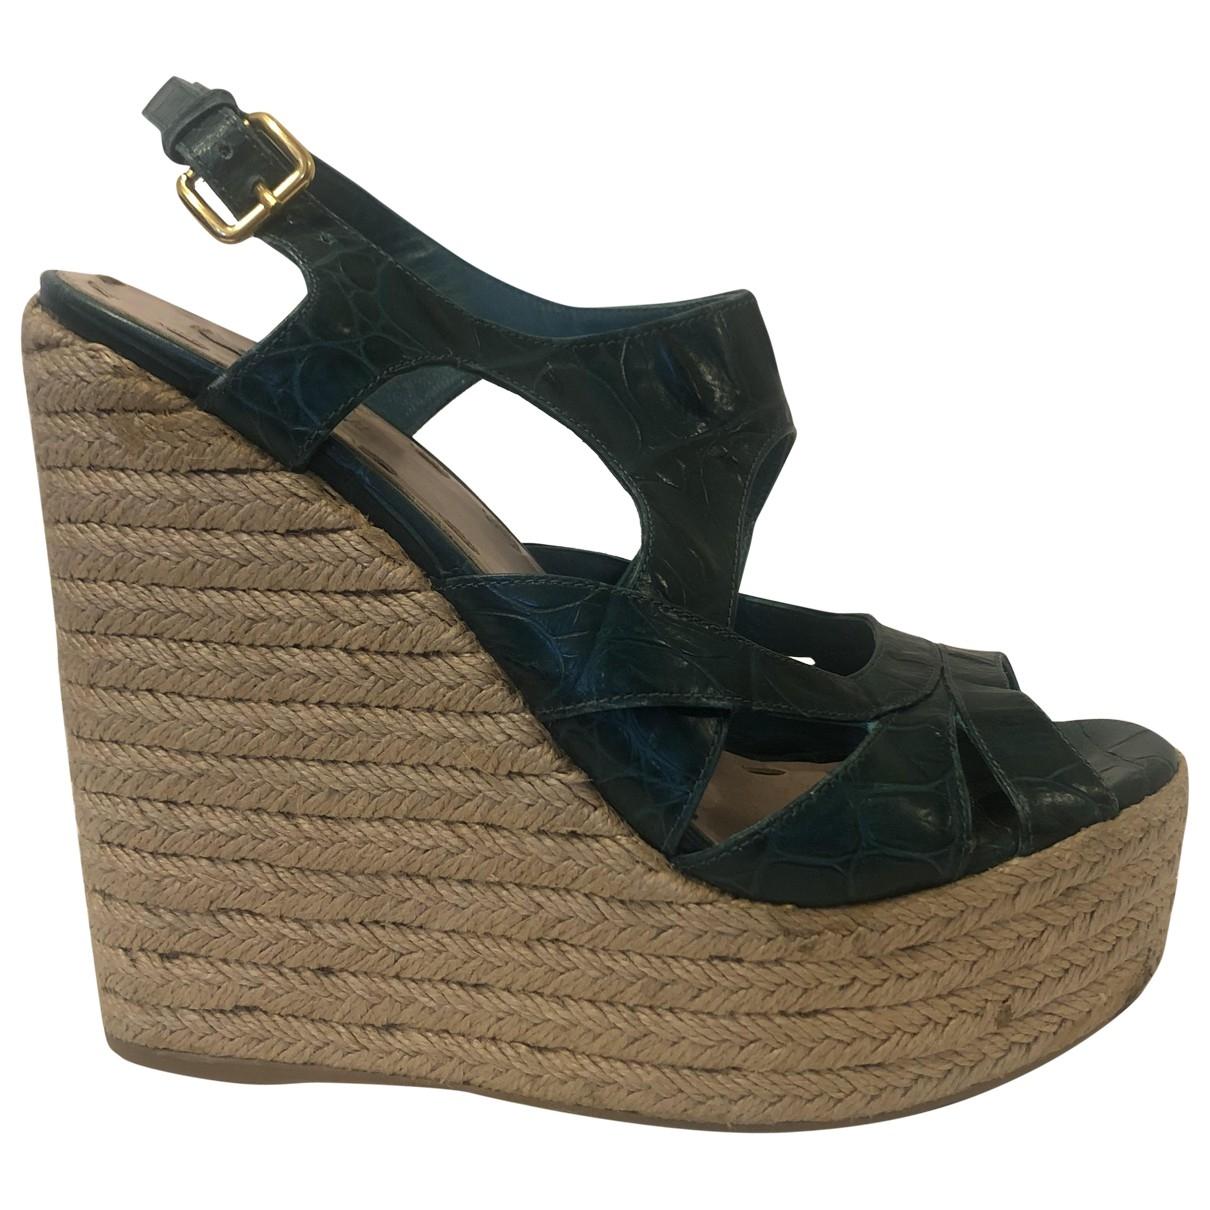 Miu Miu \N Green Leather Sandals for Women 39 EU